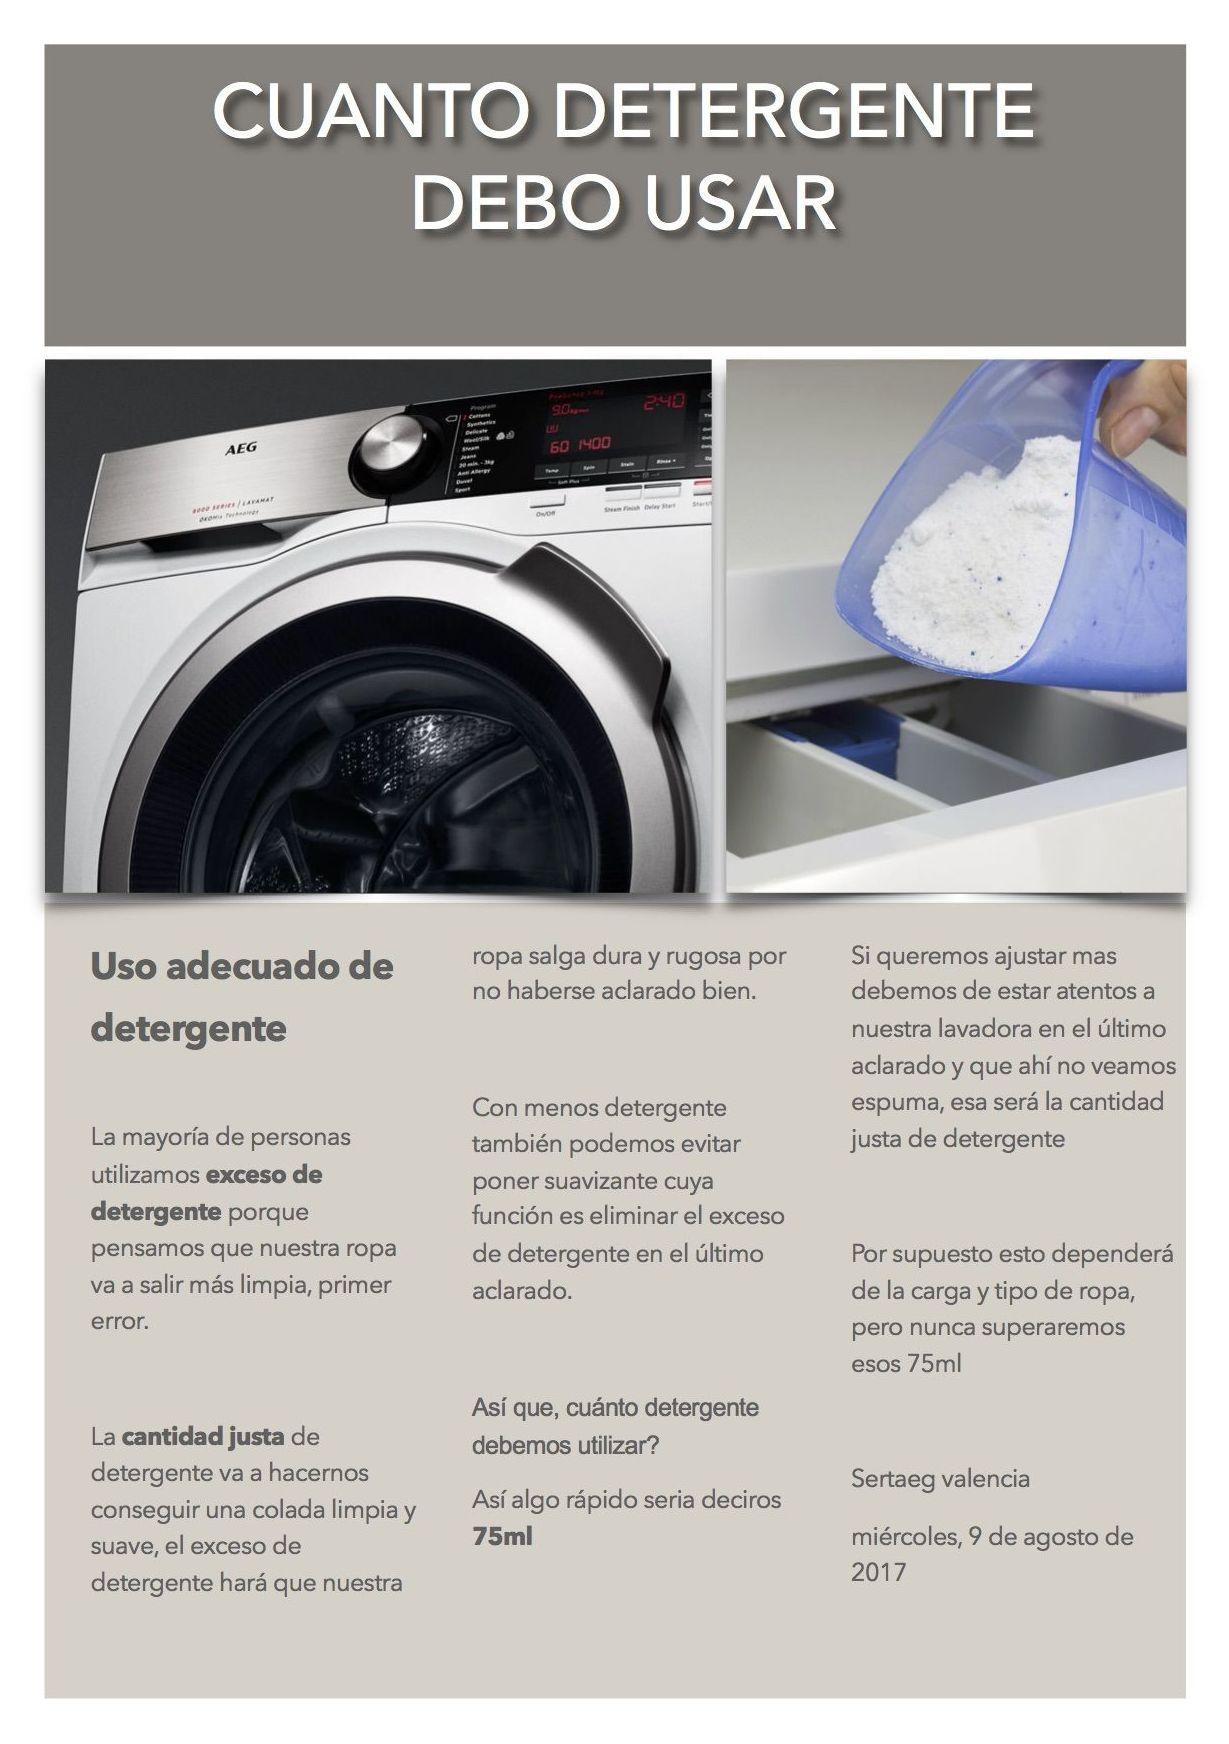 Uso adecuado de detergente